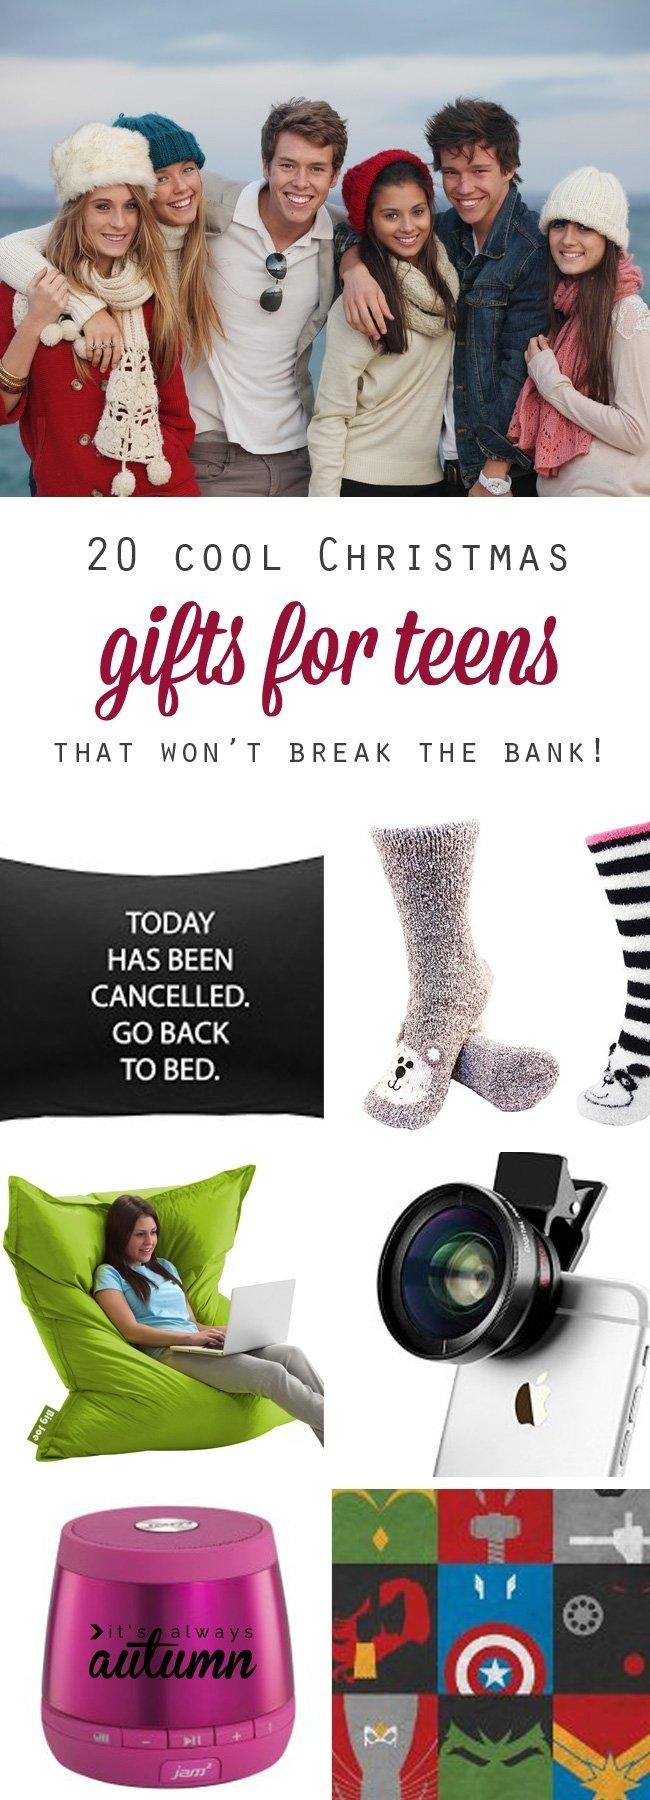 10 Best Good Christmas Gift Ideas For Teenage Girls best christmas gift ideas for teens its always autumn 8 2020